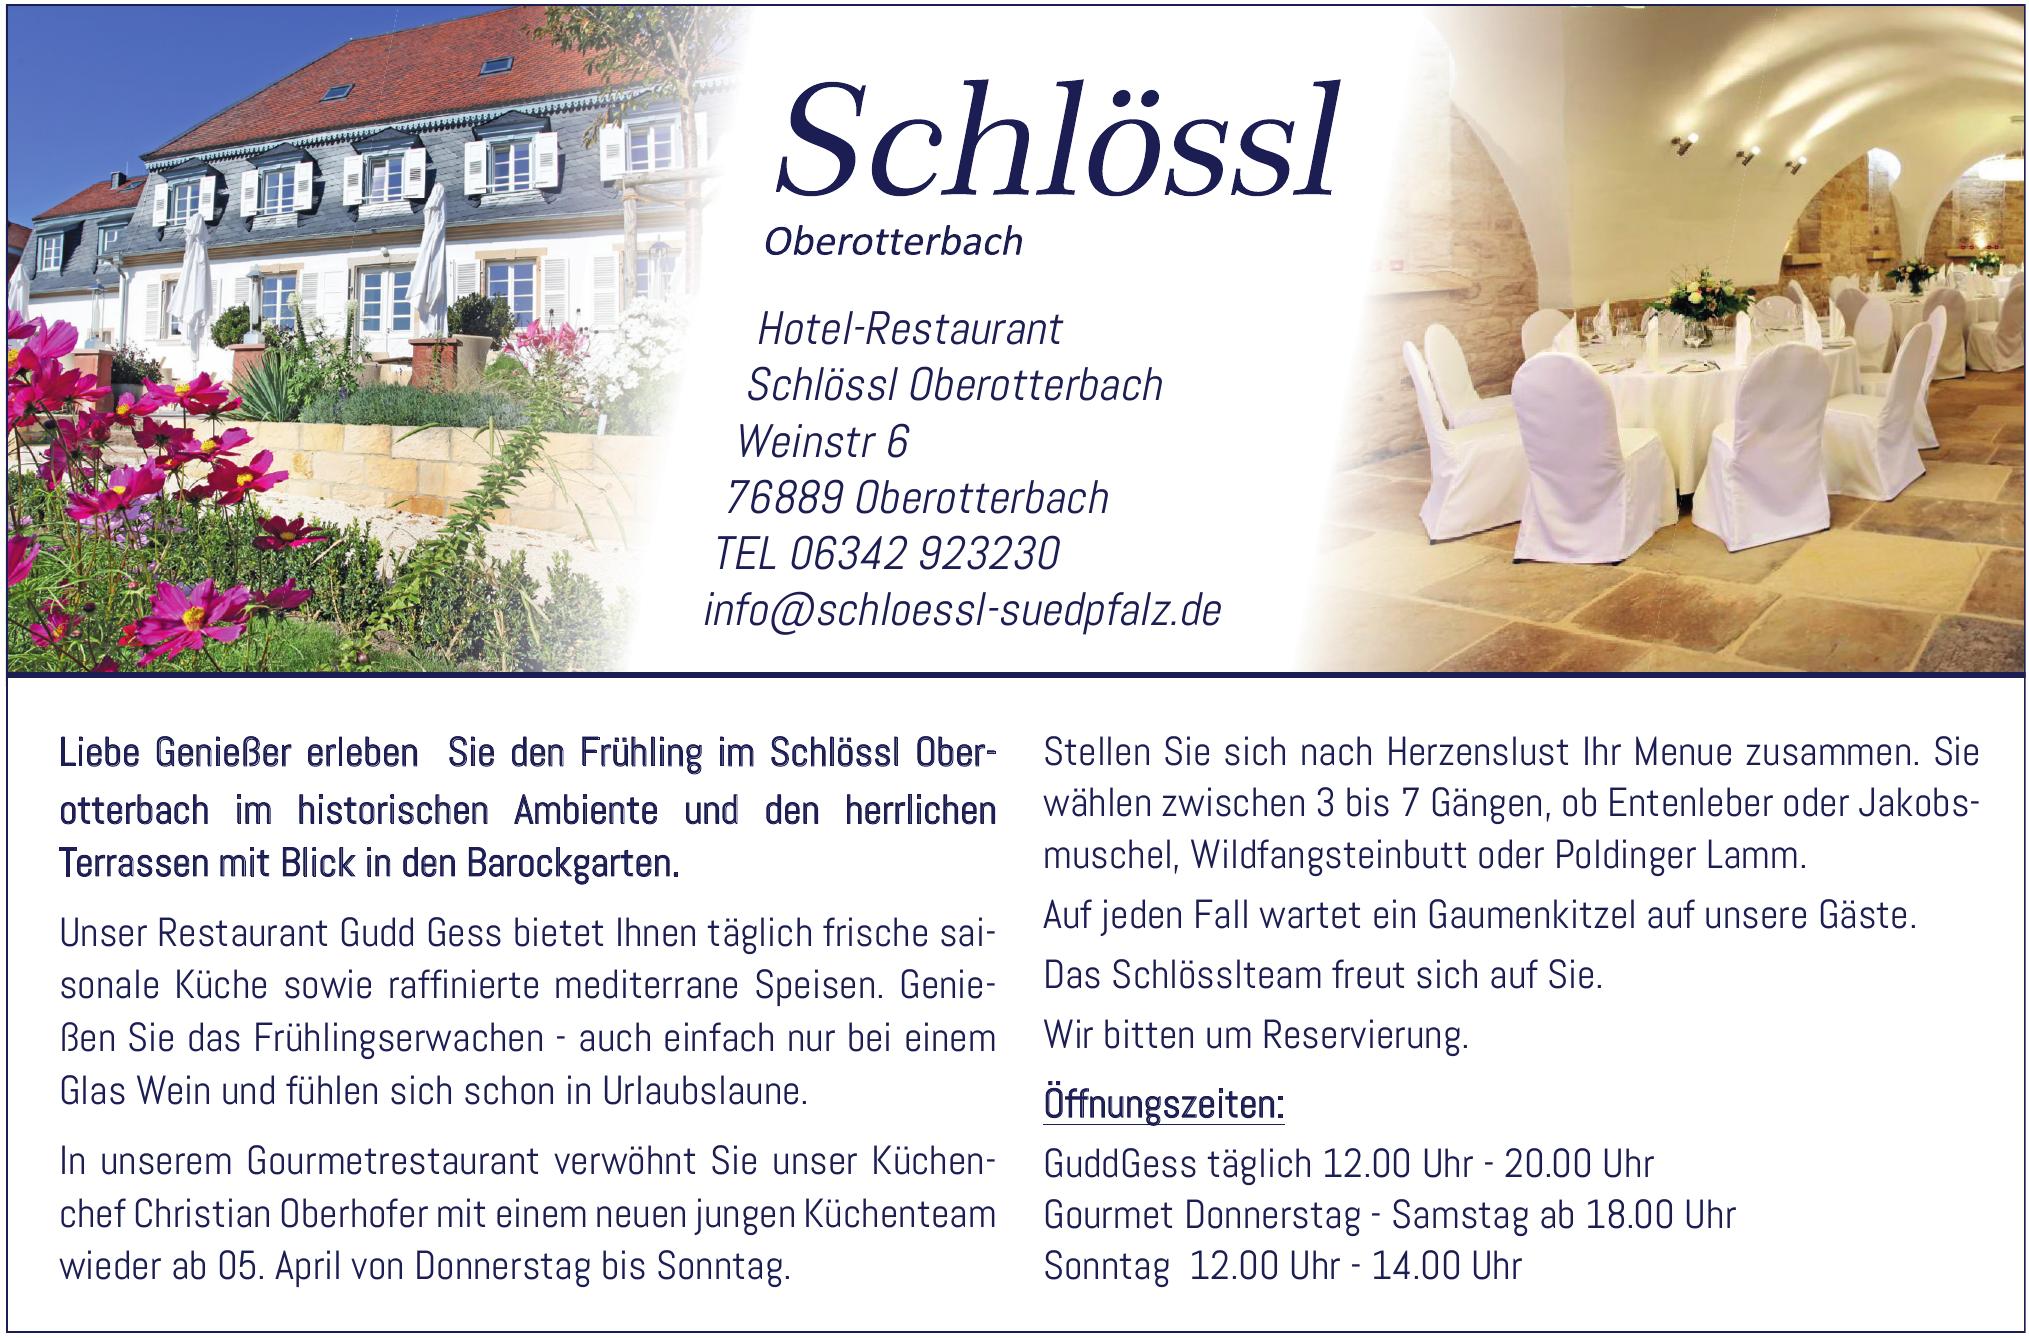 Hotel-Restaurant Schlössl Oberotterbach